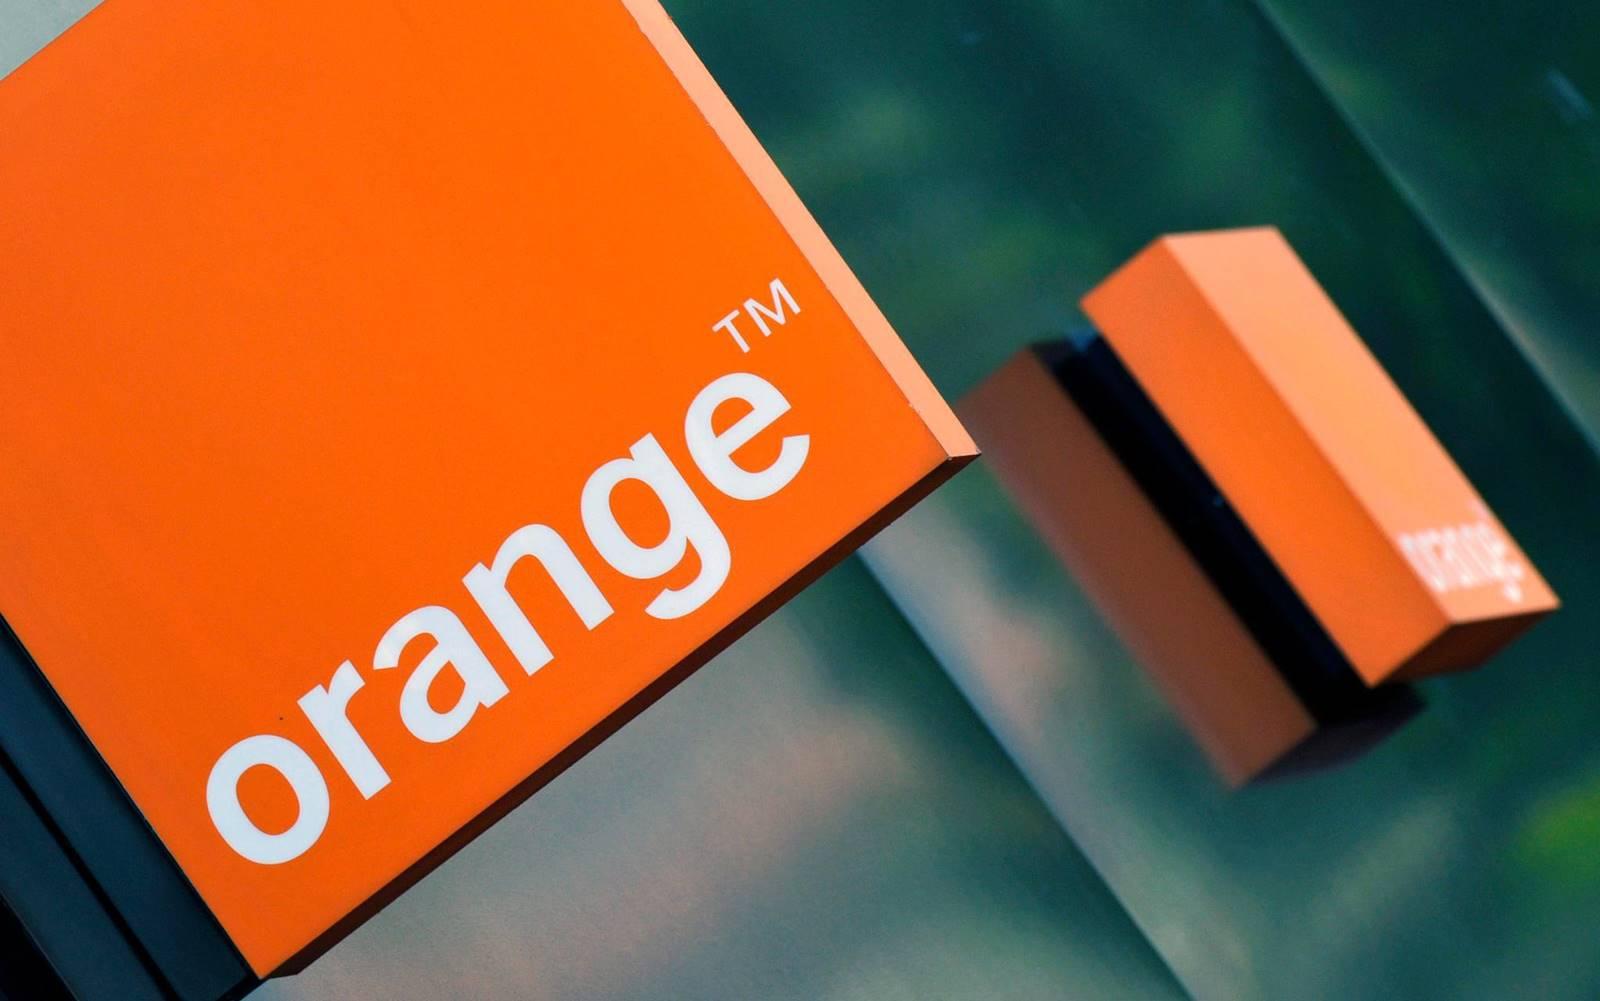 Orange siguranta